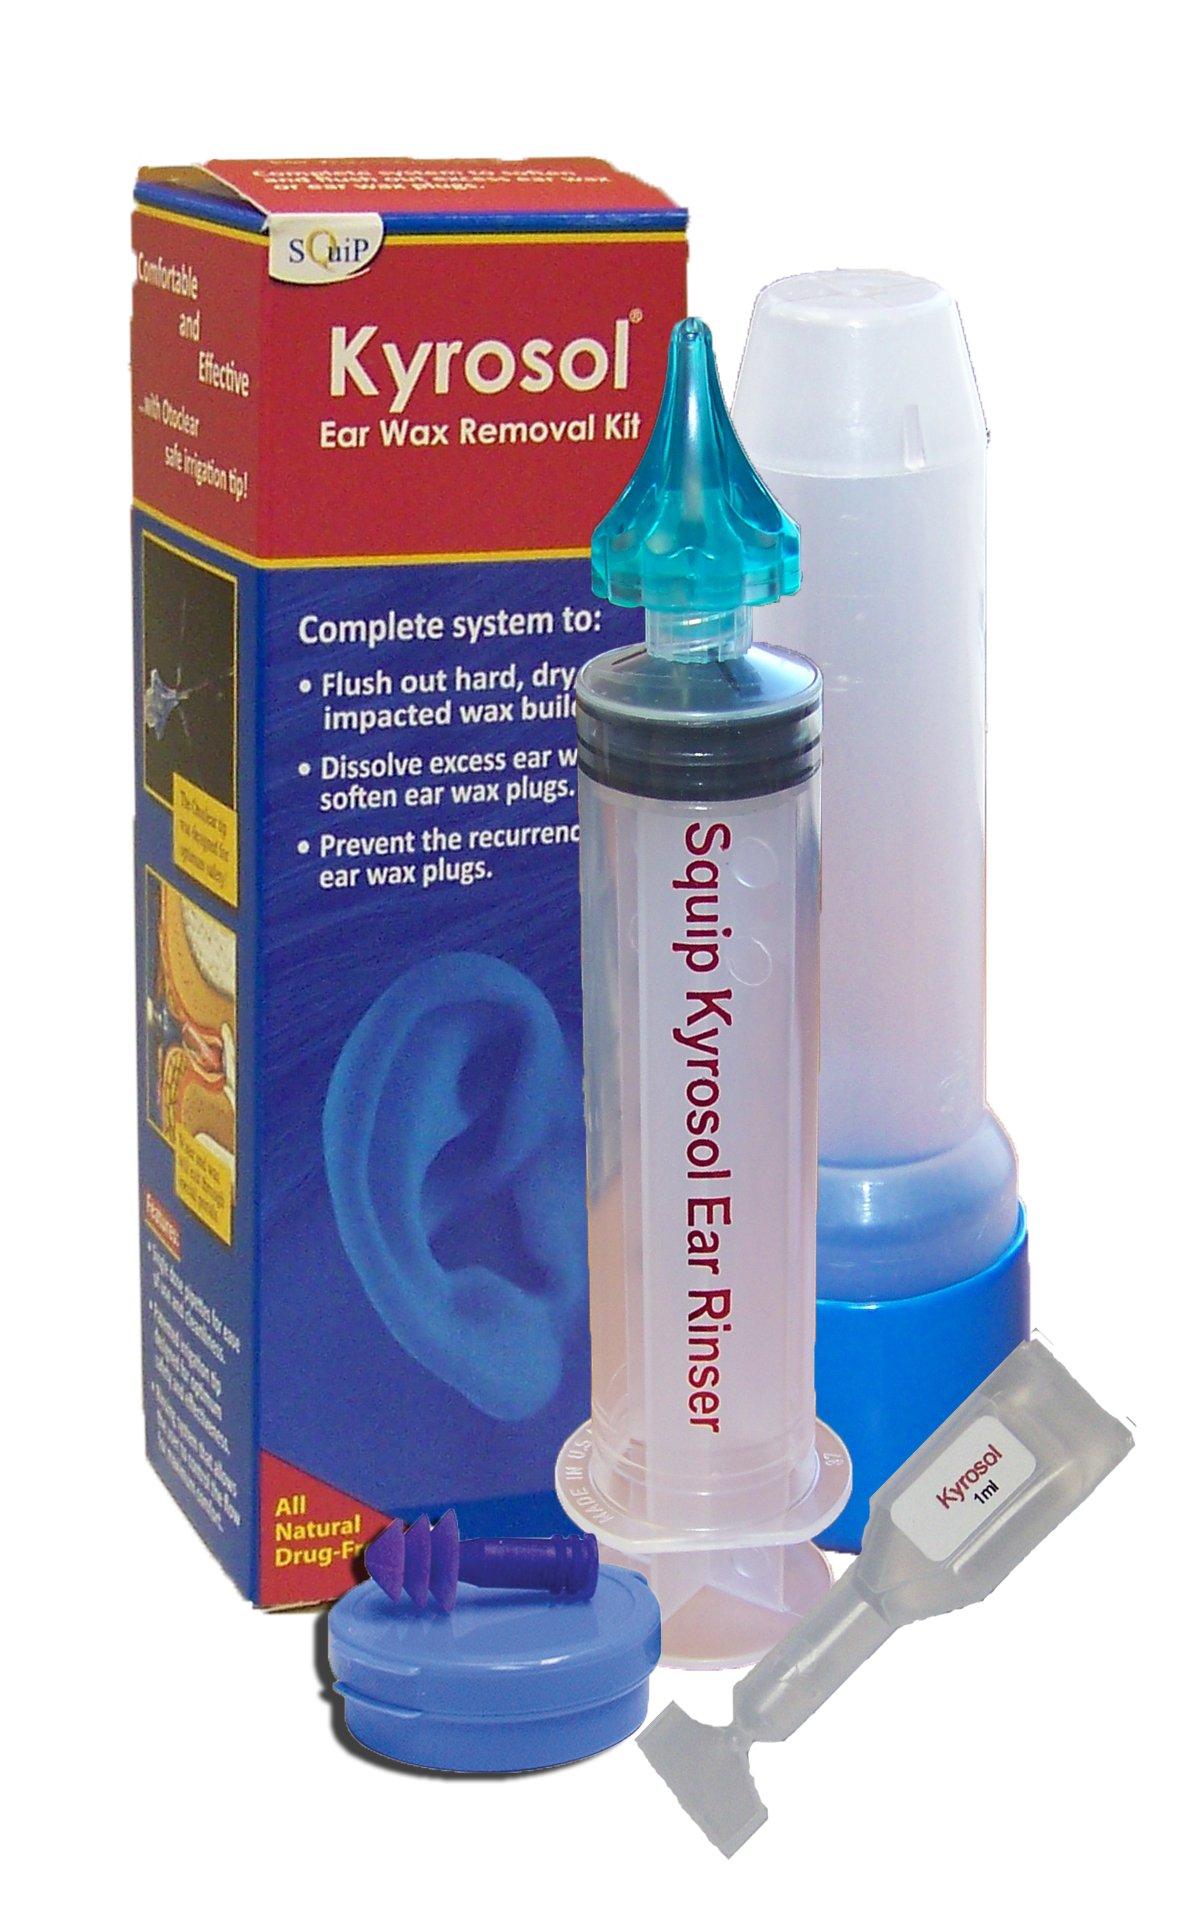 Squip Kyrosol-Ear Wax Removal Kit